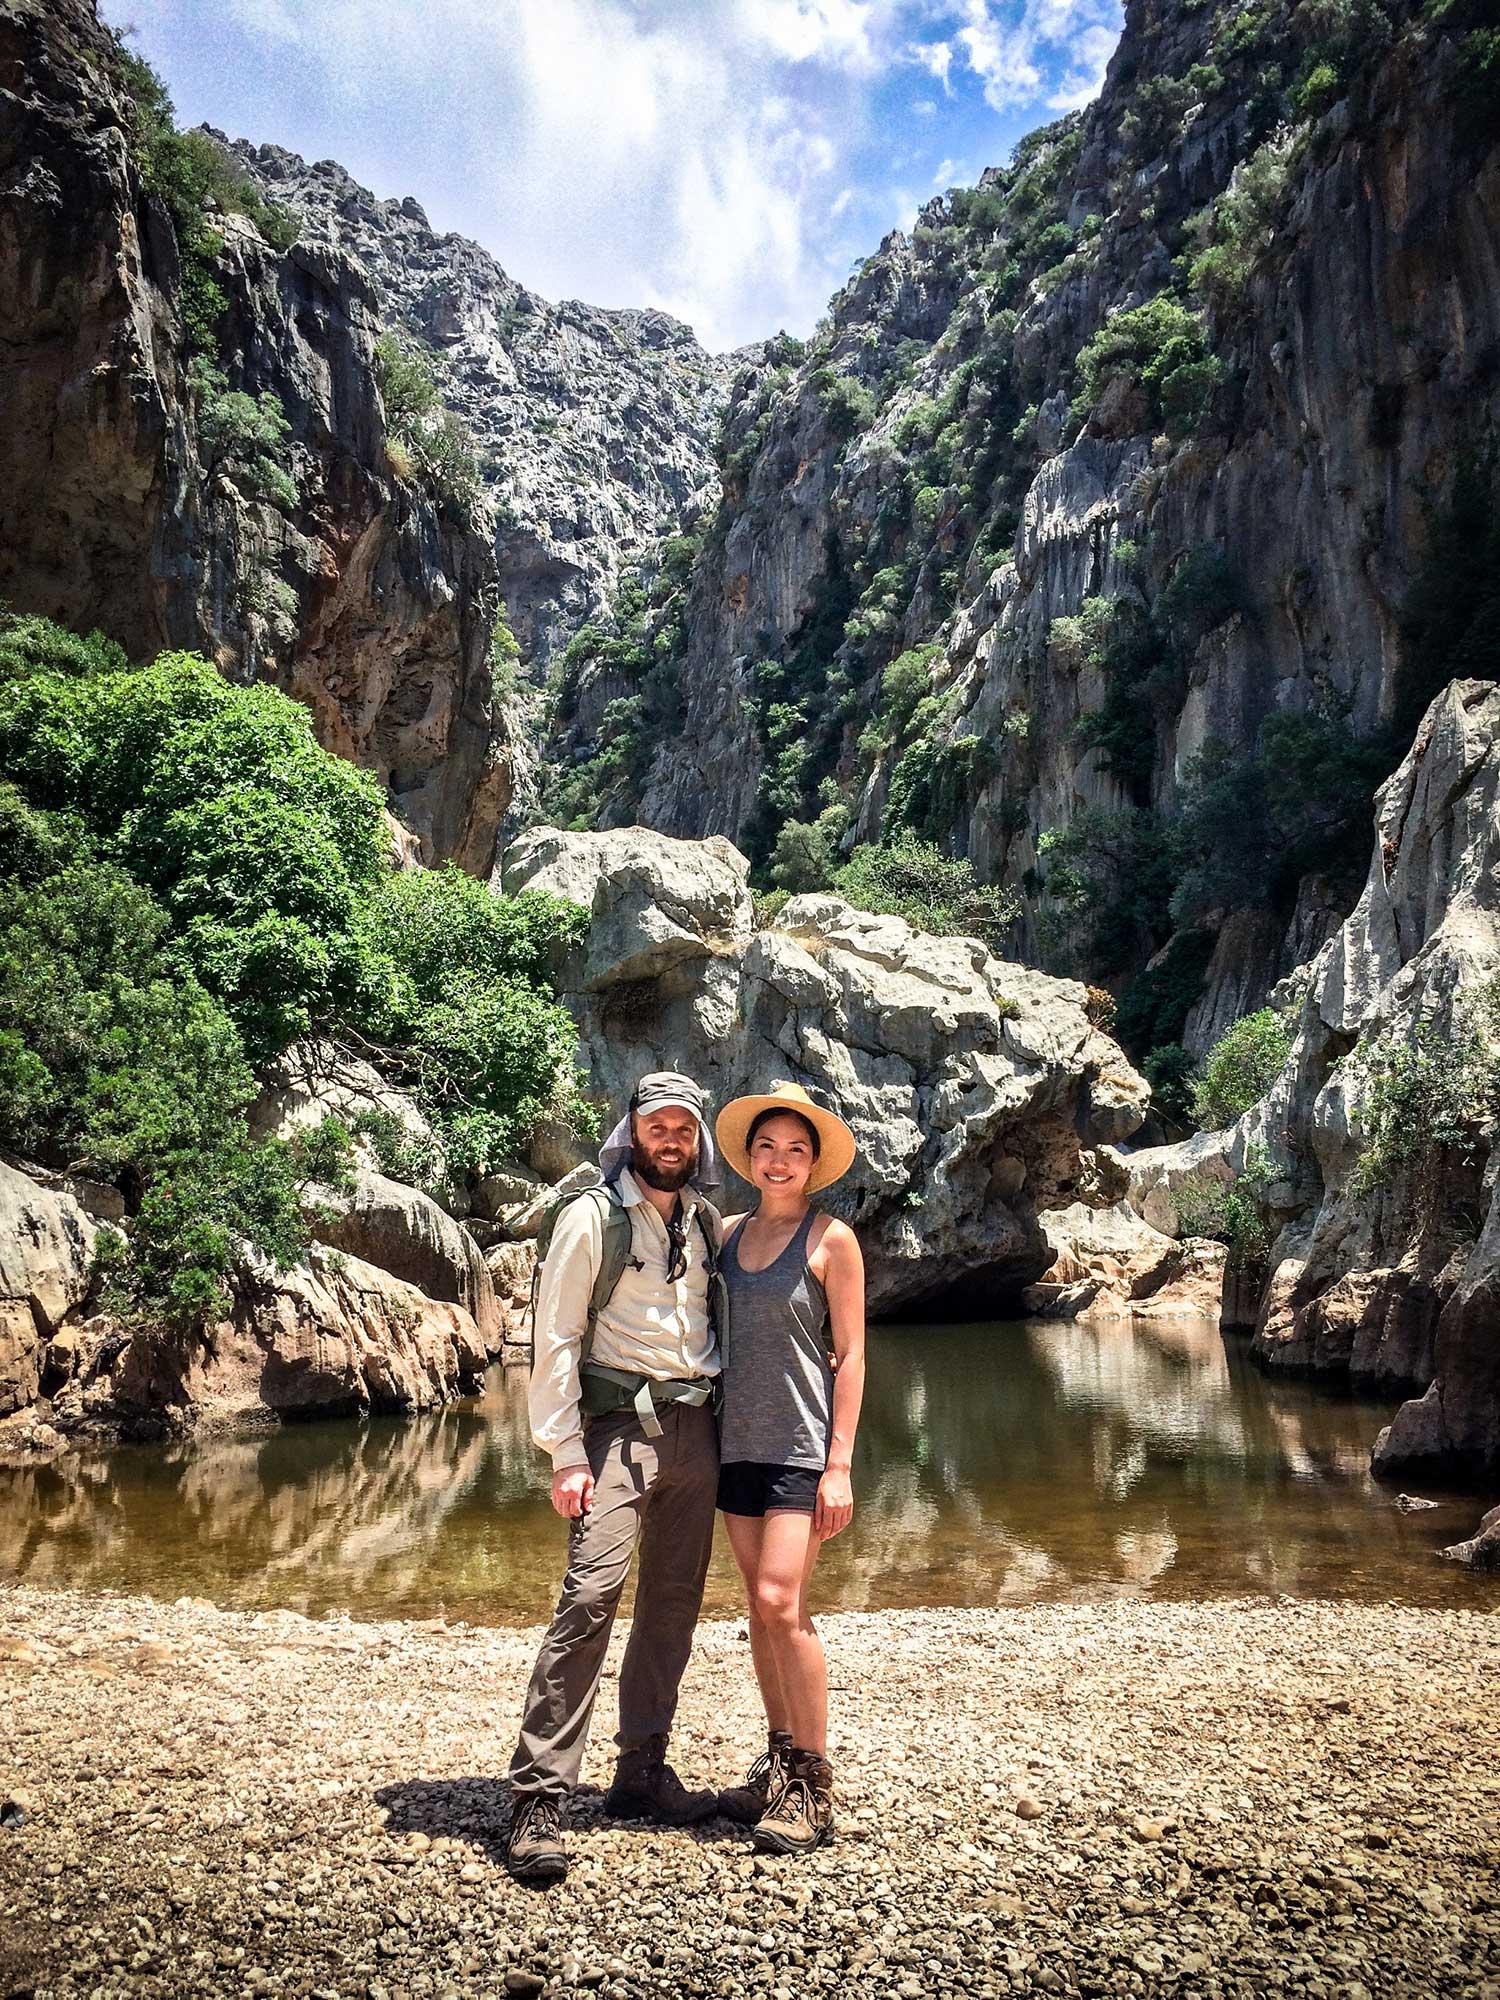 TDP-60-hiking-couple-torrent-de-pareis-mallorca-day-hike.jpg